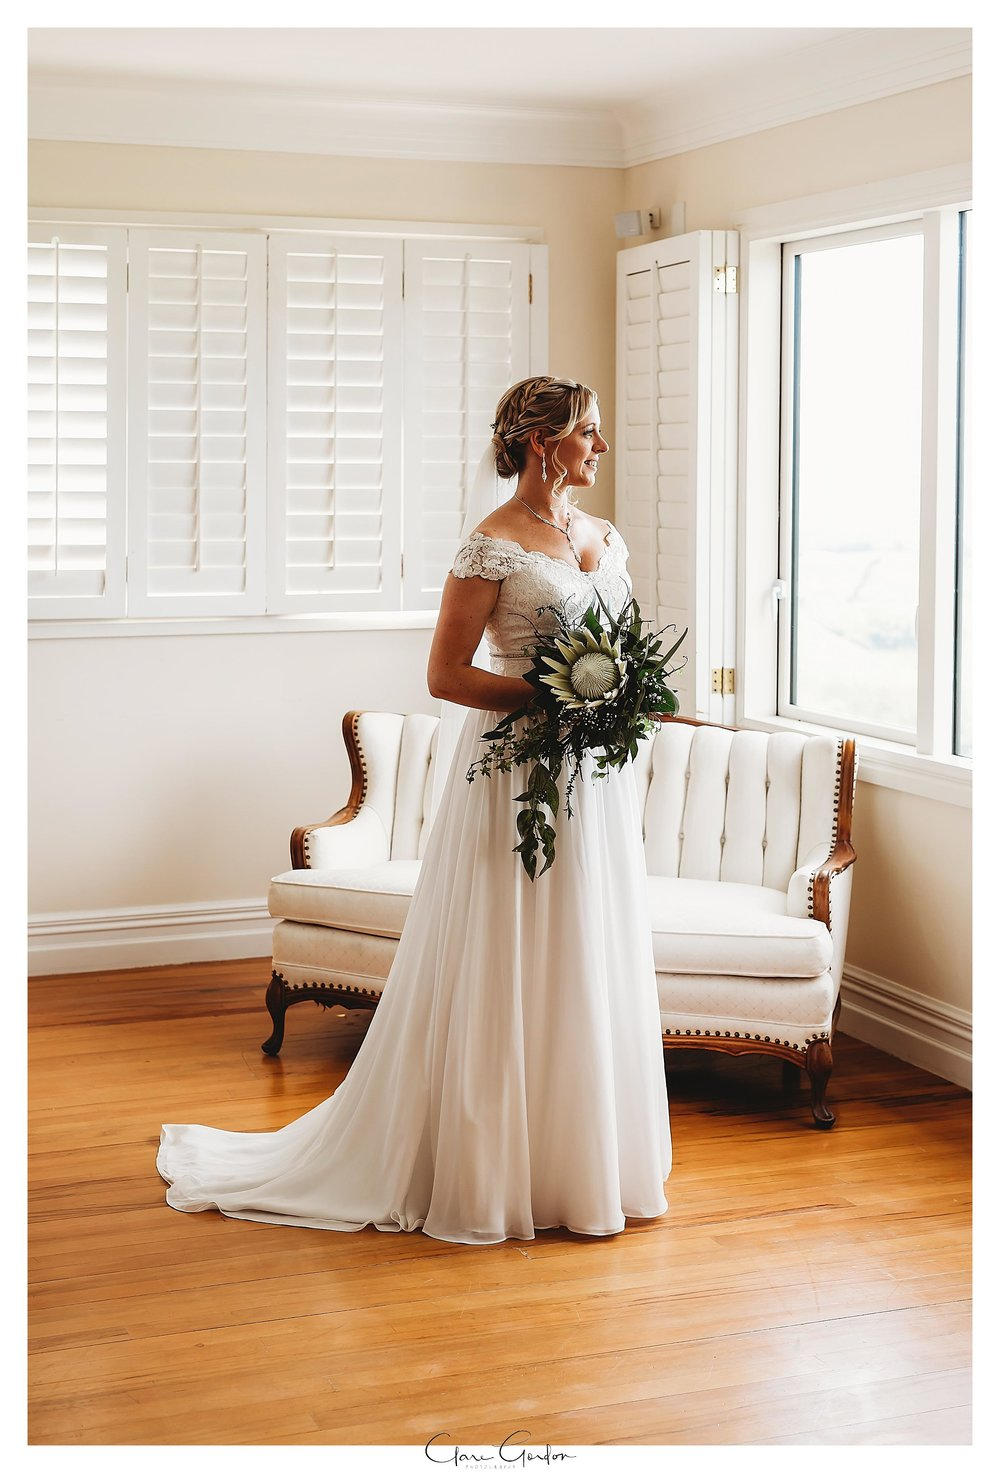 Eagle-Ridge-wedding-photo-bride-getting-ready-Tauranga (54).jpg